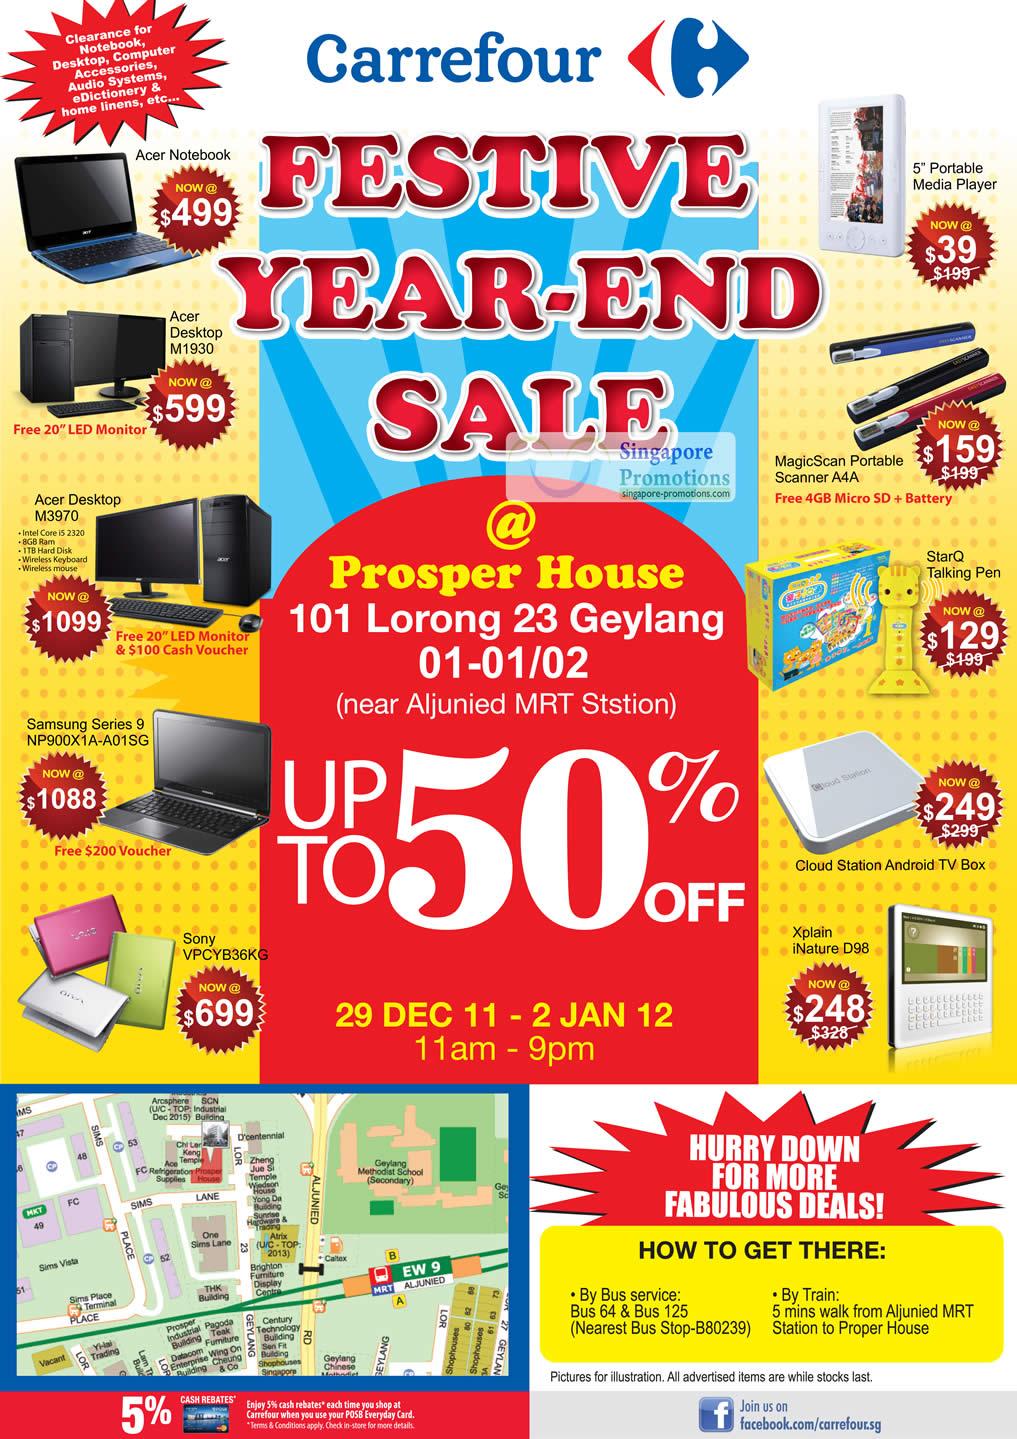 Acer Desktop M1930, Acer Desktop M3970, MagicScan Portable Scanner A4A, StarQ Talking Pen, Sony VPCYB36KG Notebook, Xplain iNature D98